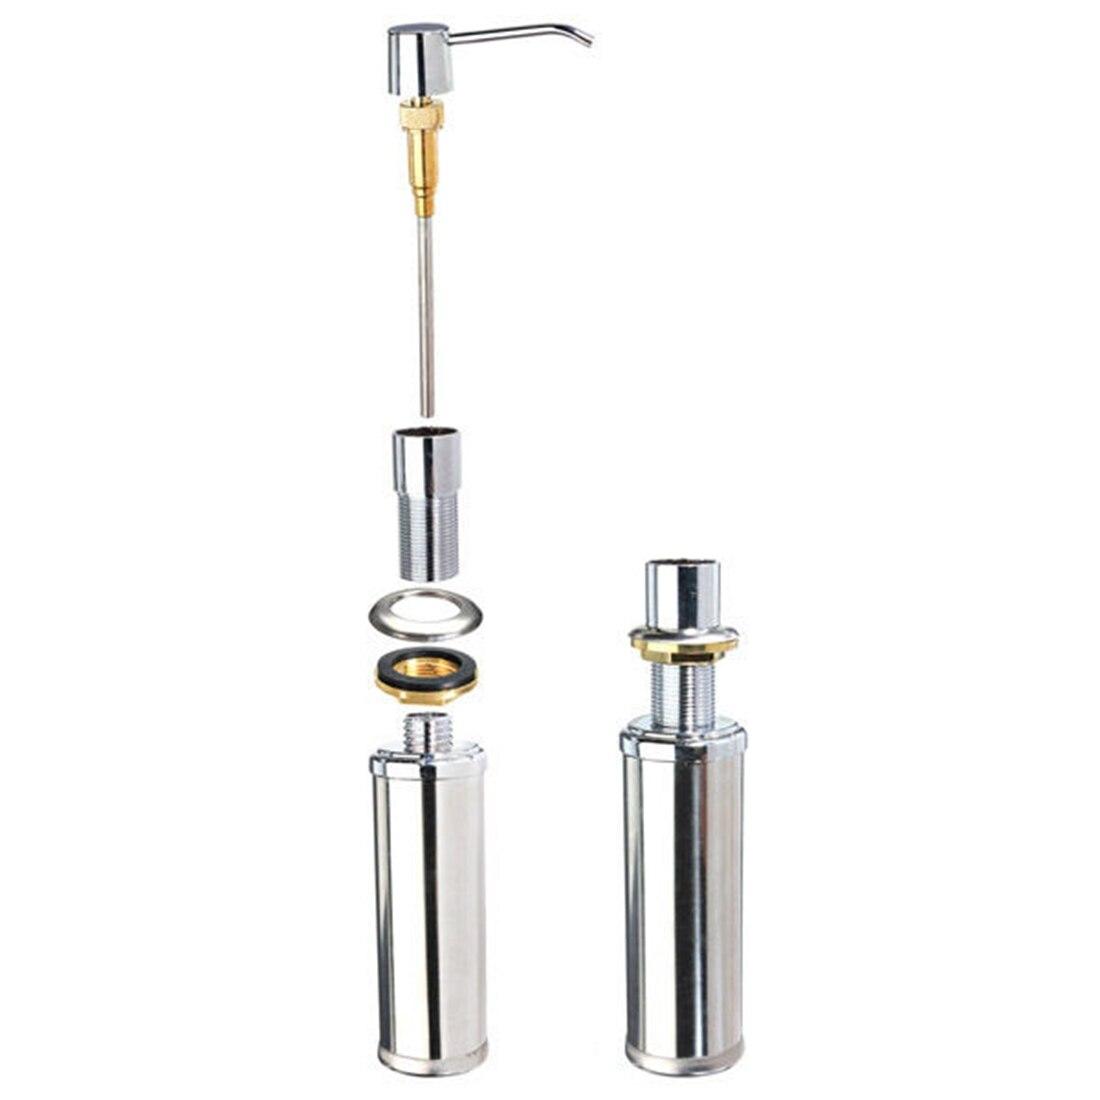 Soap Dispenser Kitchen Sink Faucet Bathroom Shower Lotion Shampoo Pump 350ML Silver